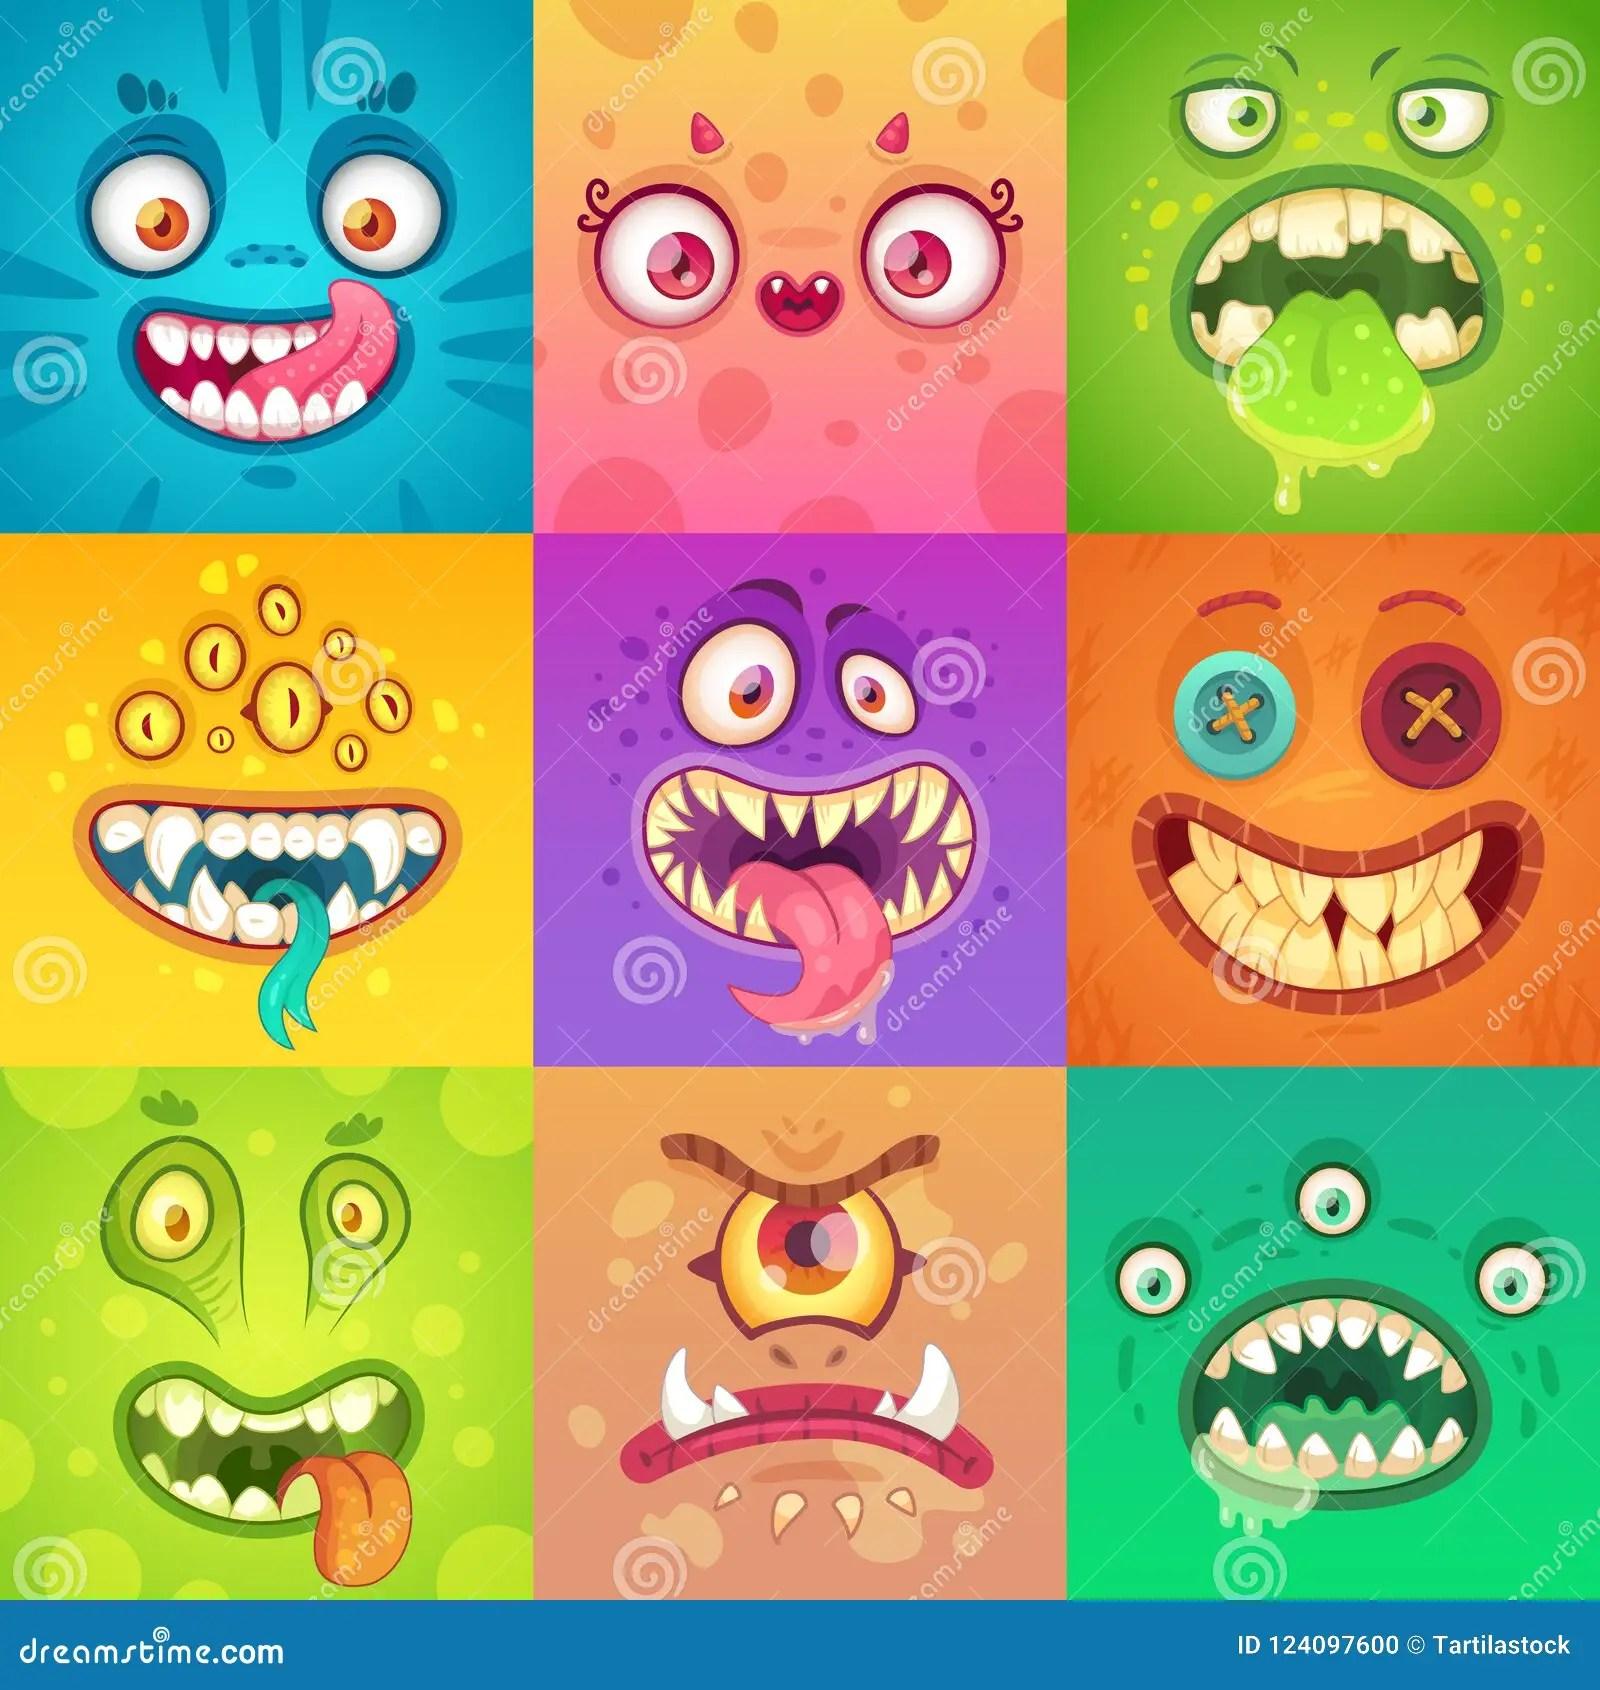 hight resolution of monster eyes stock illustrations 10 776 monster eyes stock illustrations vectors clipart dreamstime